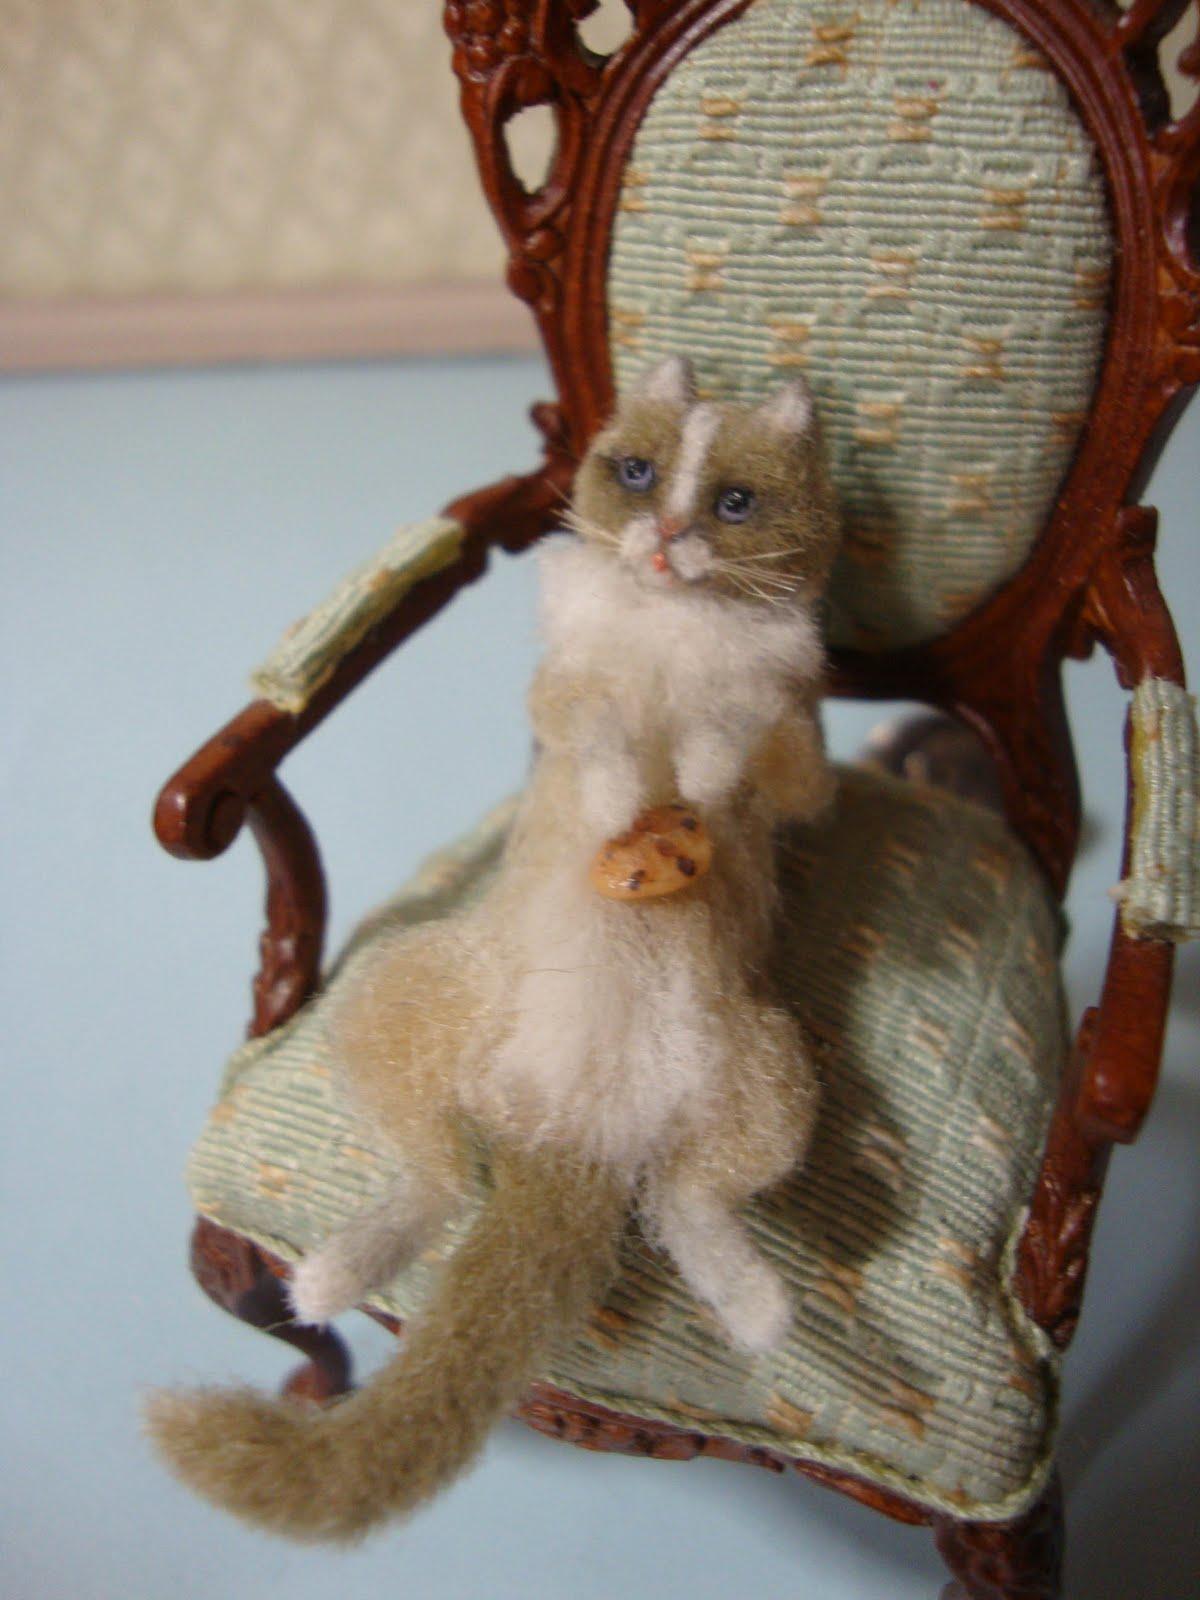 Bridget McCarty's Plush Pets 1:12: Miniature Cats & Pets